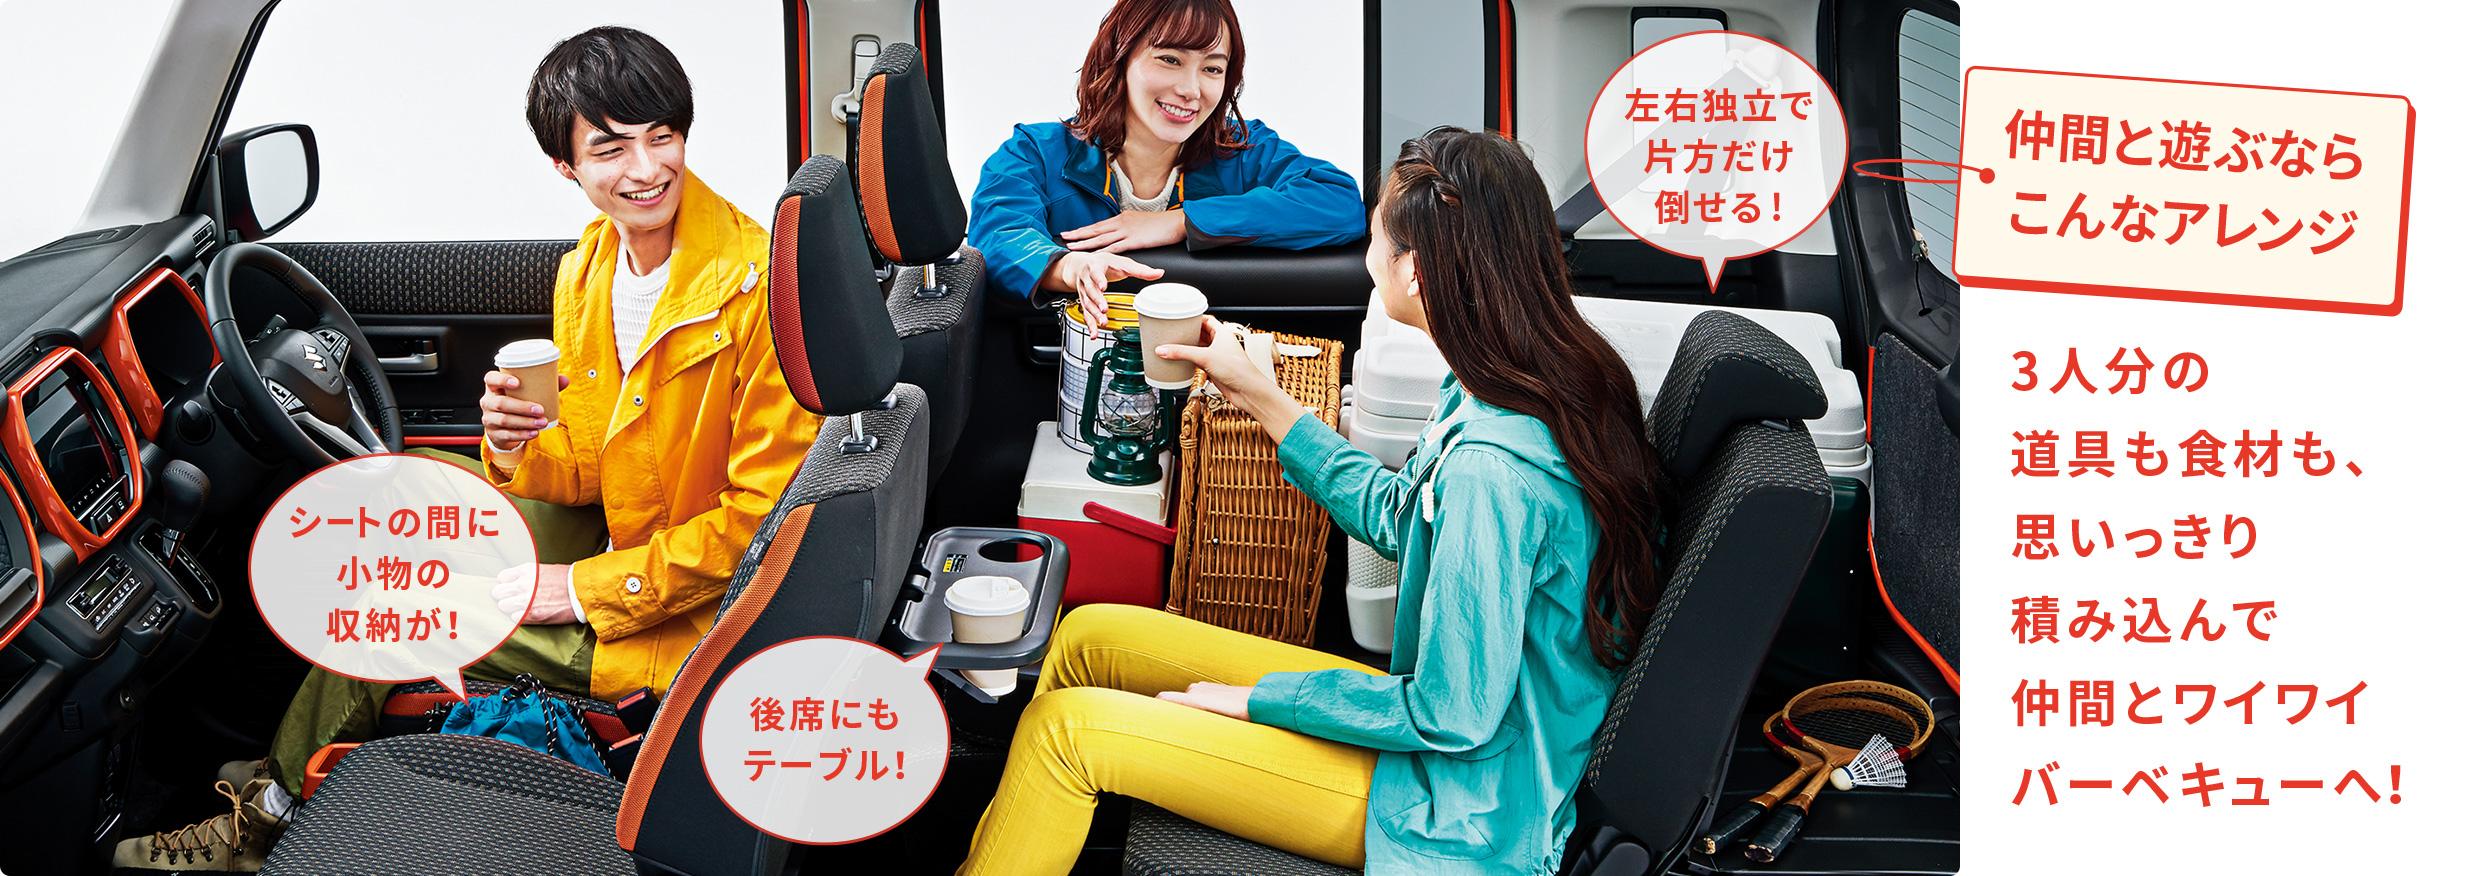 http://www.suzuki.co.jp/car/hustler/interior/img/img08.jpg